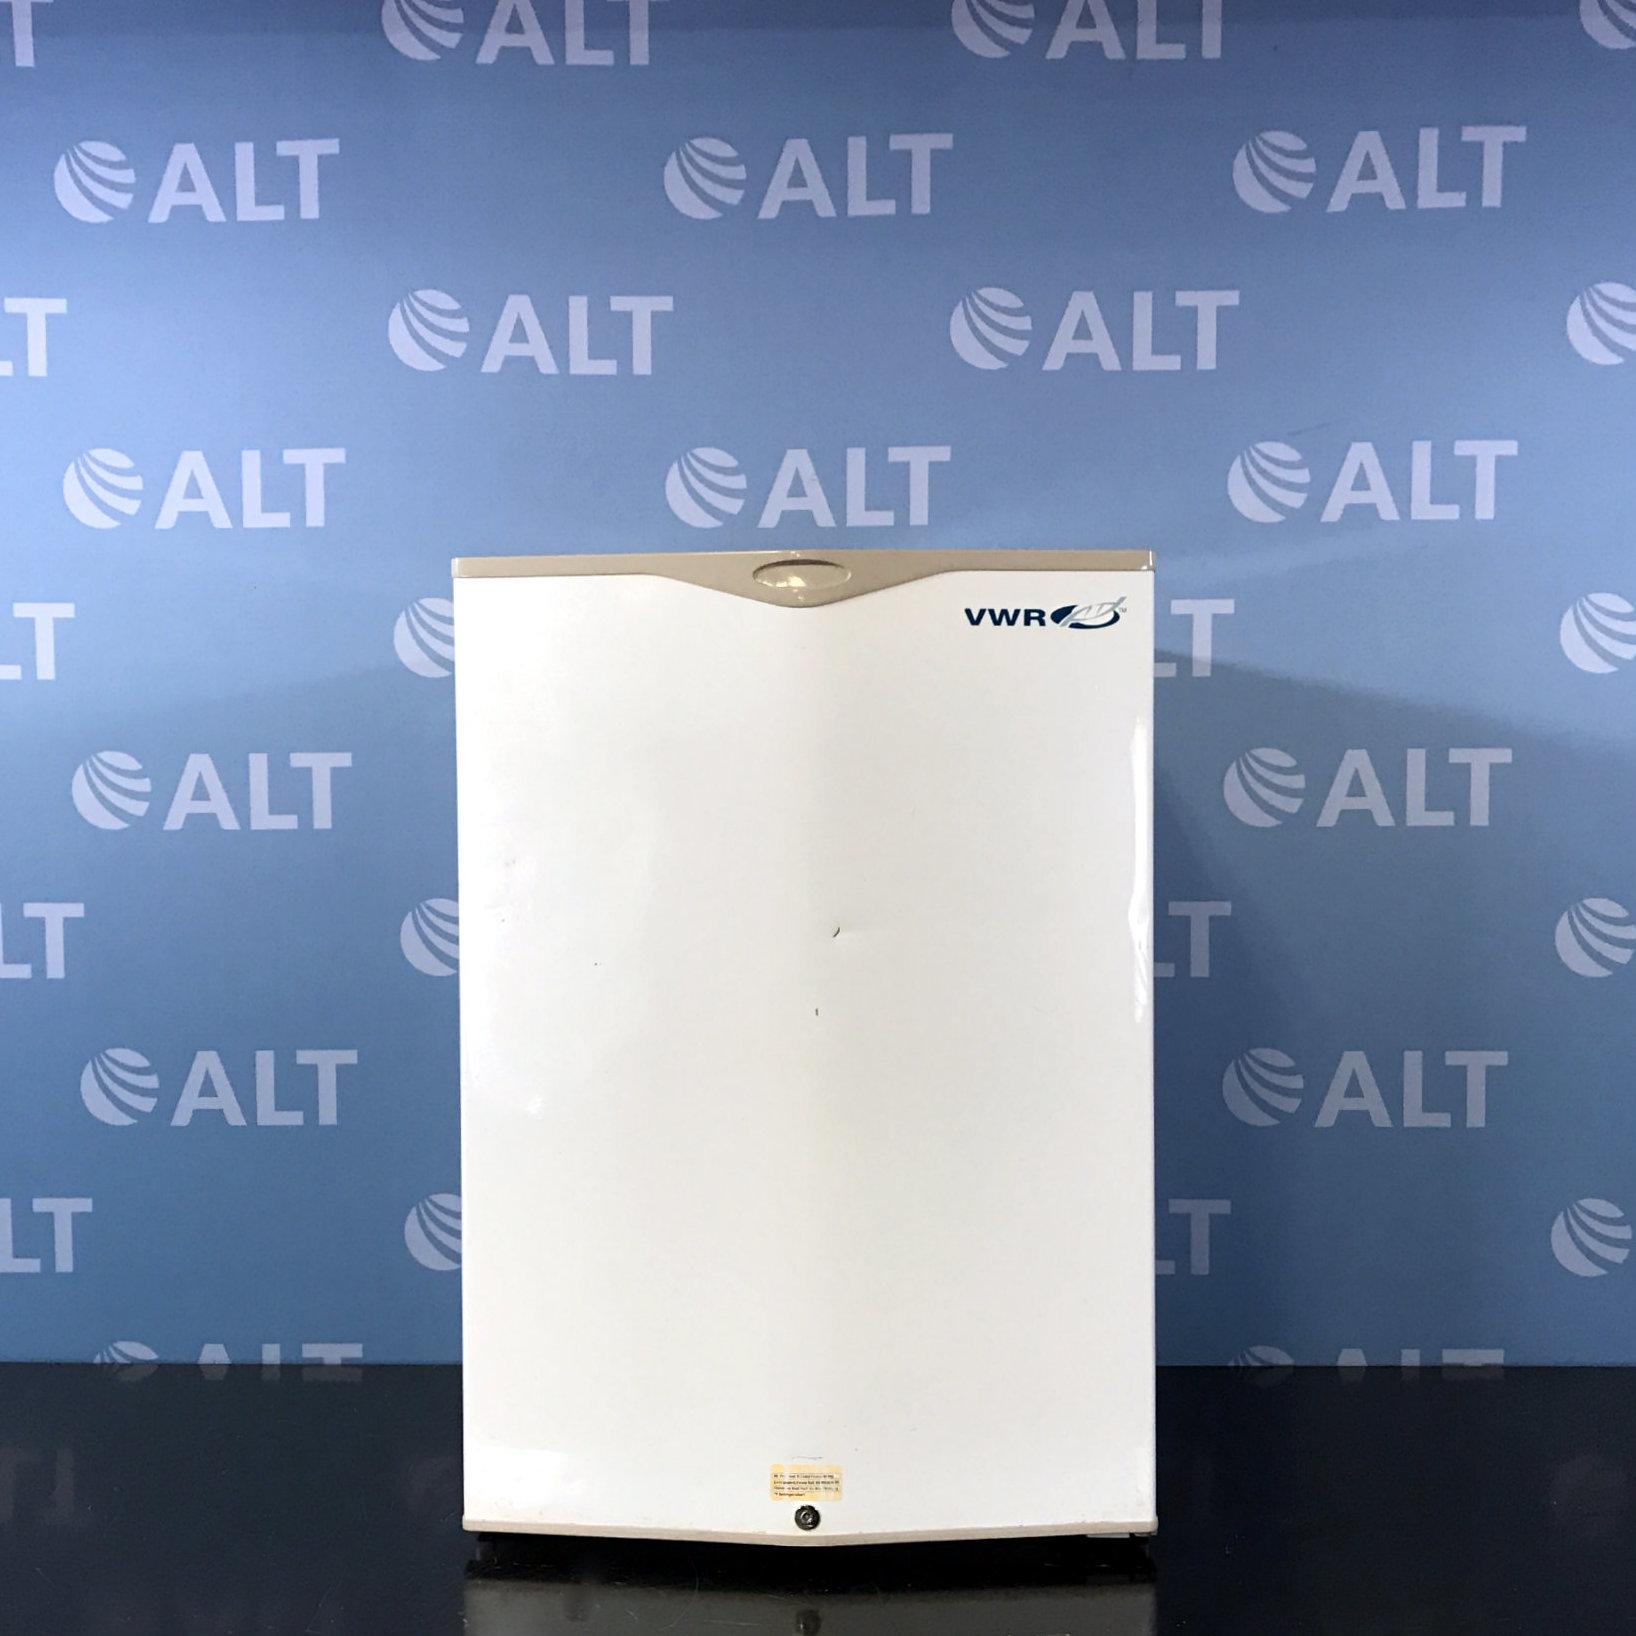 VWR Undercounter Refrigerator Model R406GA15 Image